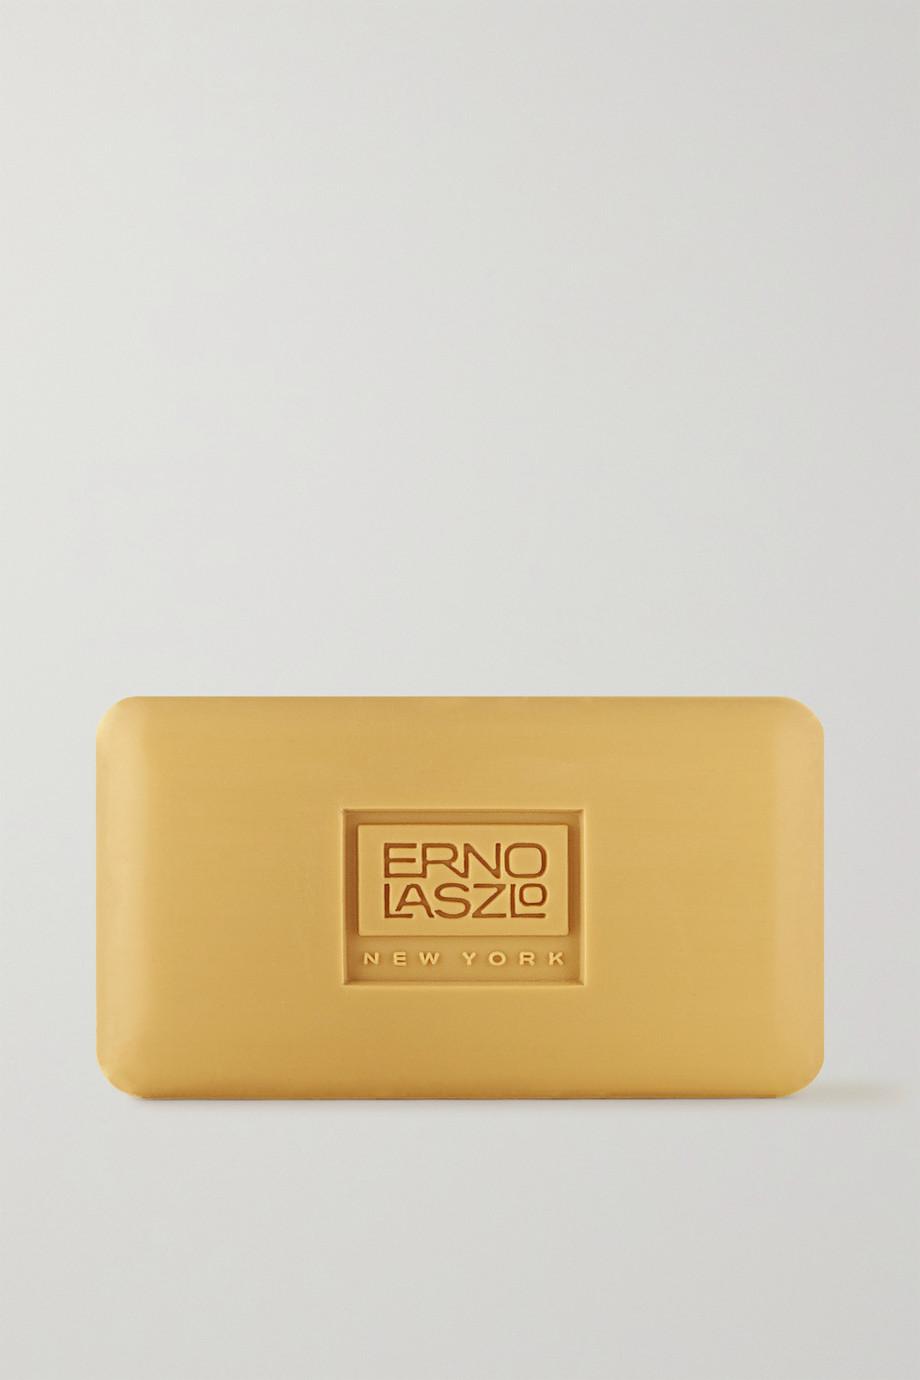 Erno Laszlo Phelityl Cleansing Bar, 150g – Gesichtsseife